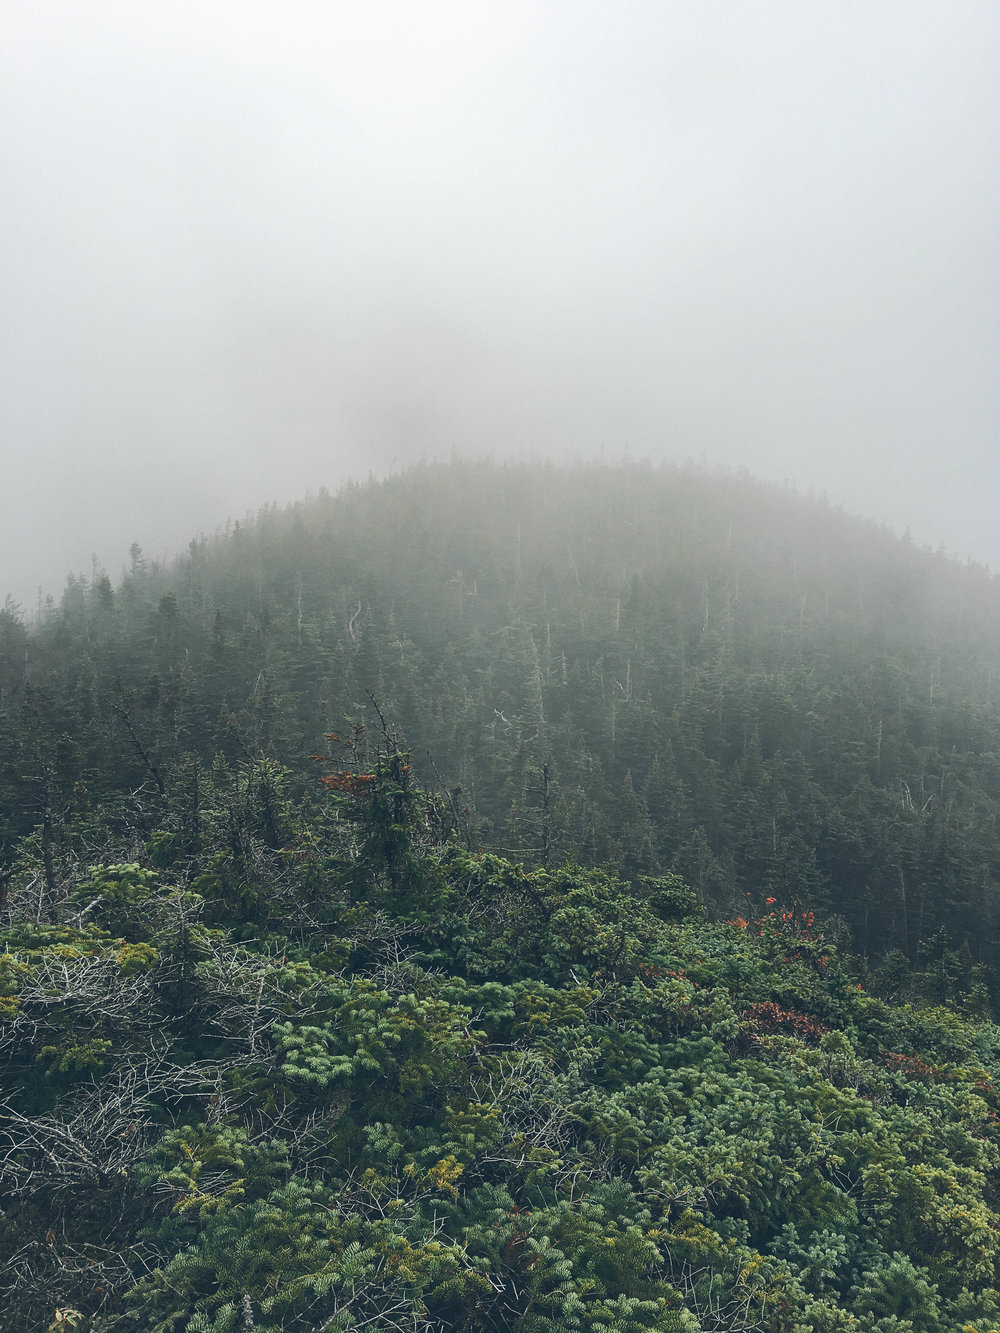 adirondacks-mt-colden-mountain-things (79 of 83).jpg